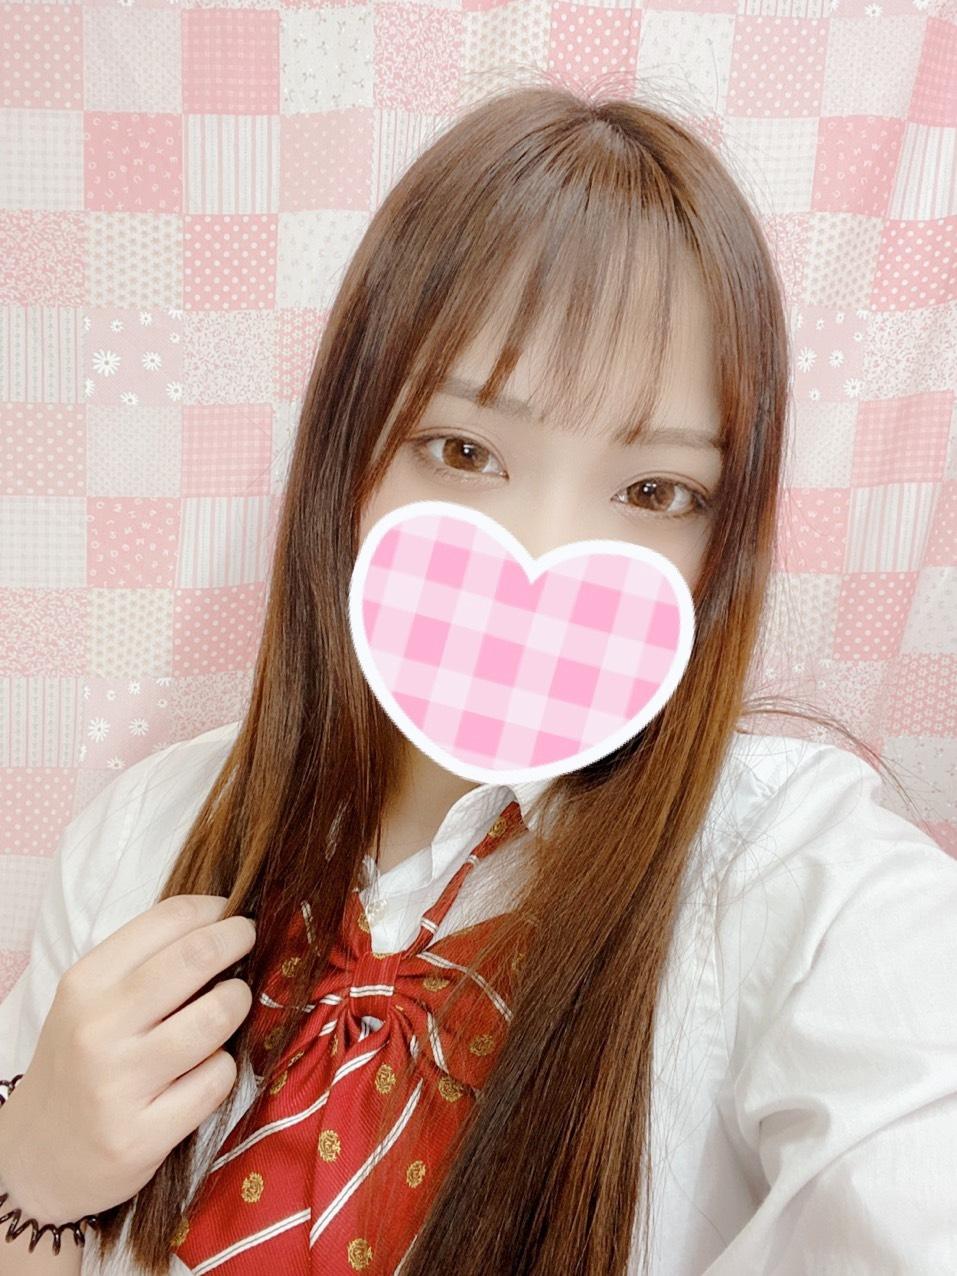 【JKリフレ東京】木下さくら 完全未経験